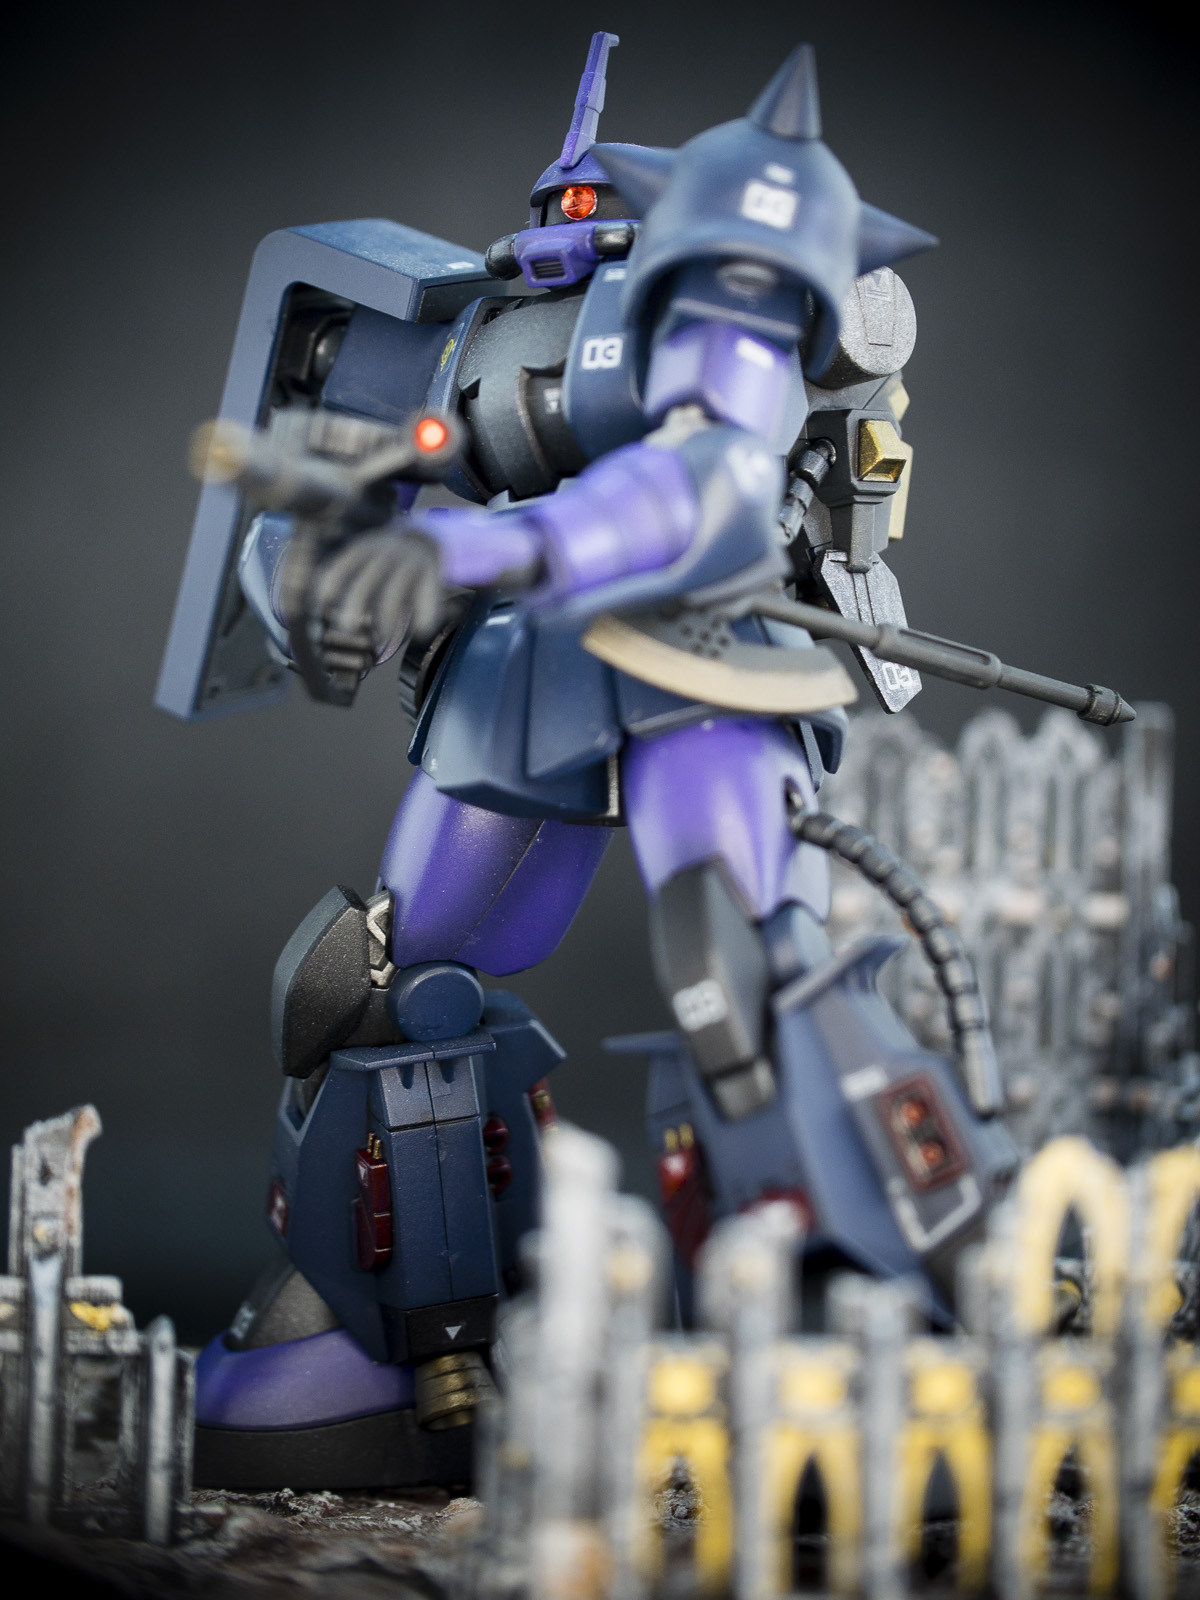 Bandai 1/144 HG MS-06R-1A Zaku 2 (Black Tri-Star)